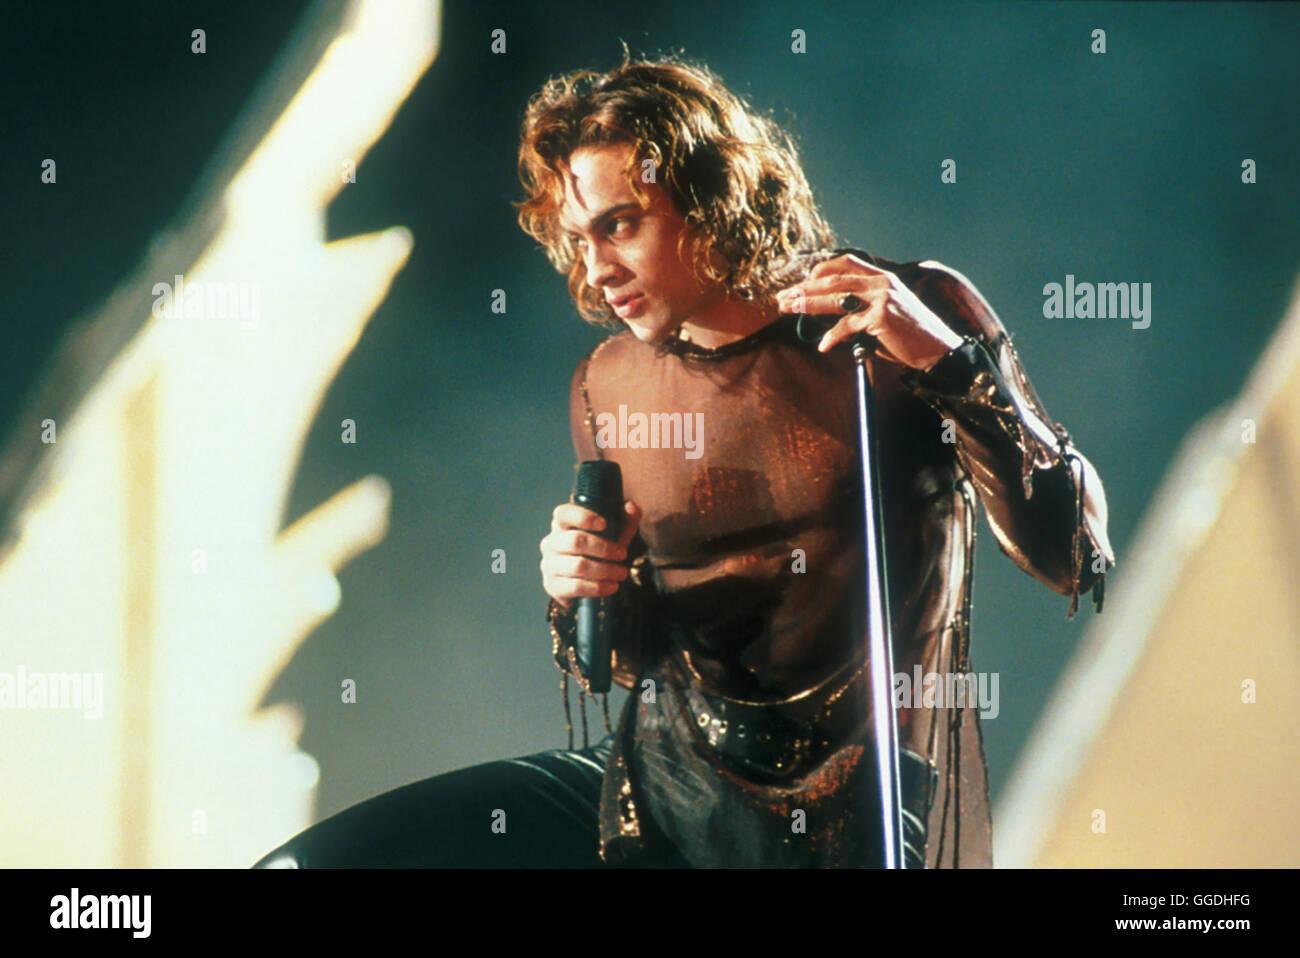 DIE KÖNIGIN DER VERDAMMTEN / The Queen of the Damned USA 2002 / Michael Rymer Der Vampir Lestat (STUART TOWNSEND) - Stock Image